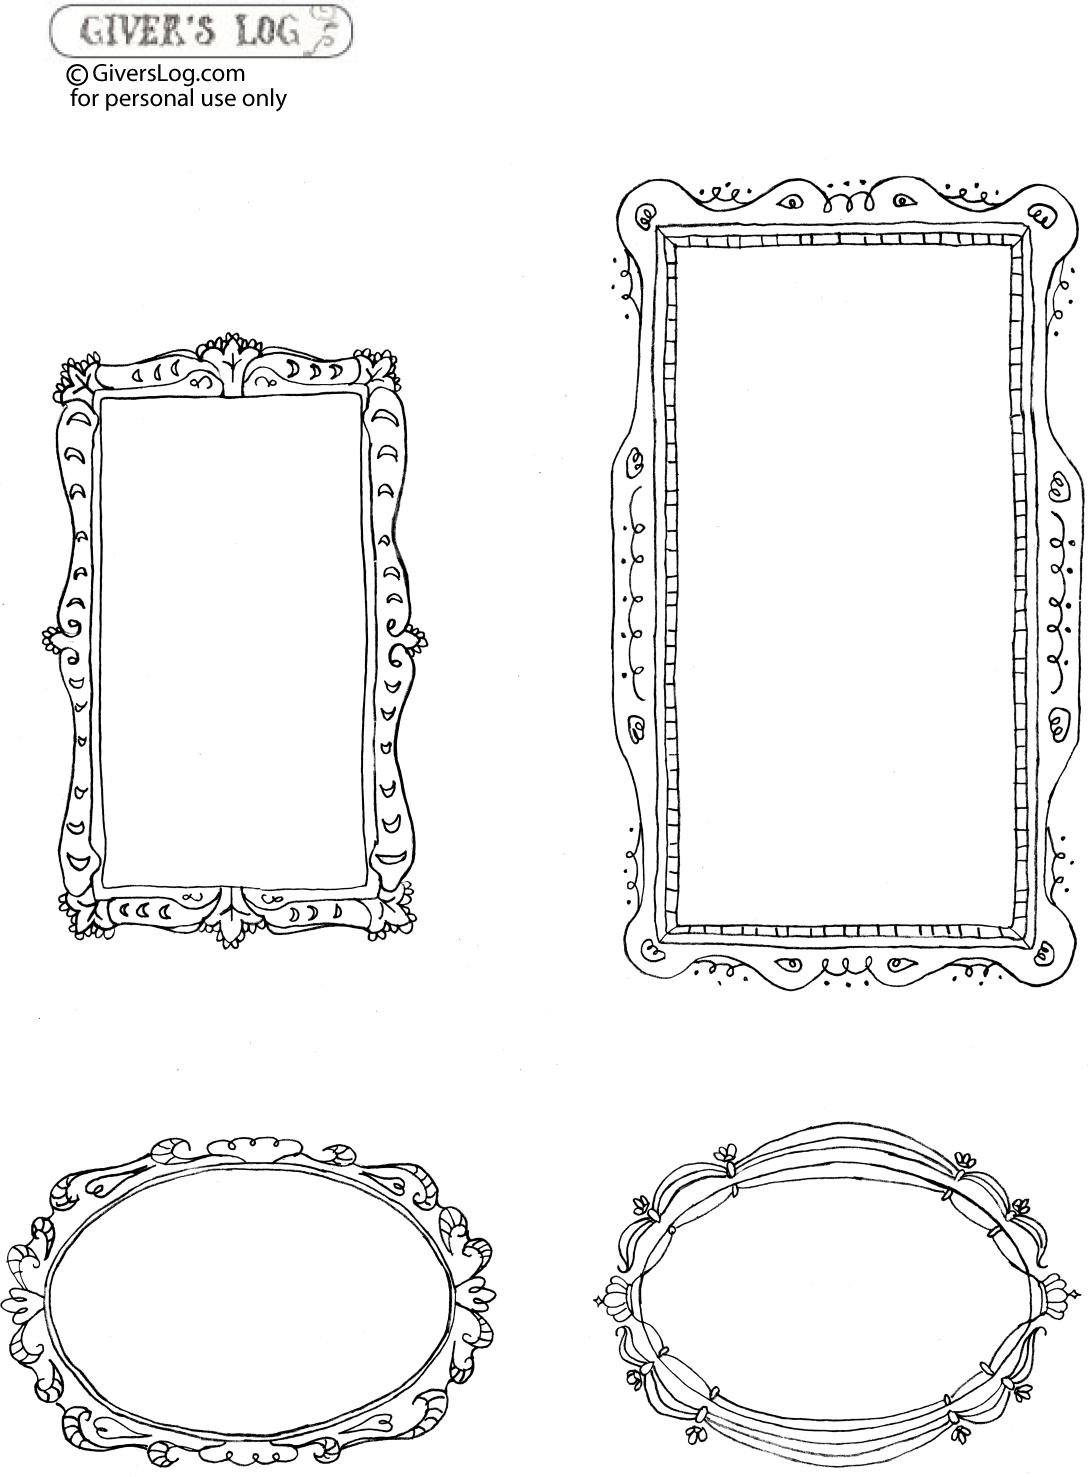 Download free-printable-frames-for-hand-soap-diy.png (PNG Image, 1088×1477 pixels) - Sca   Printable ...